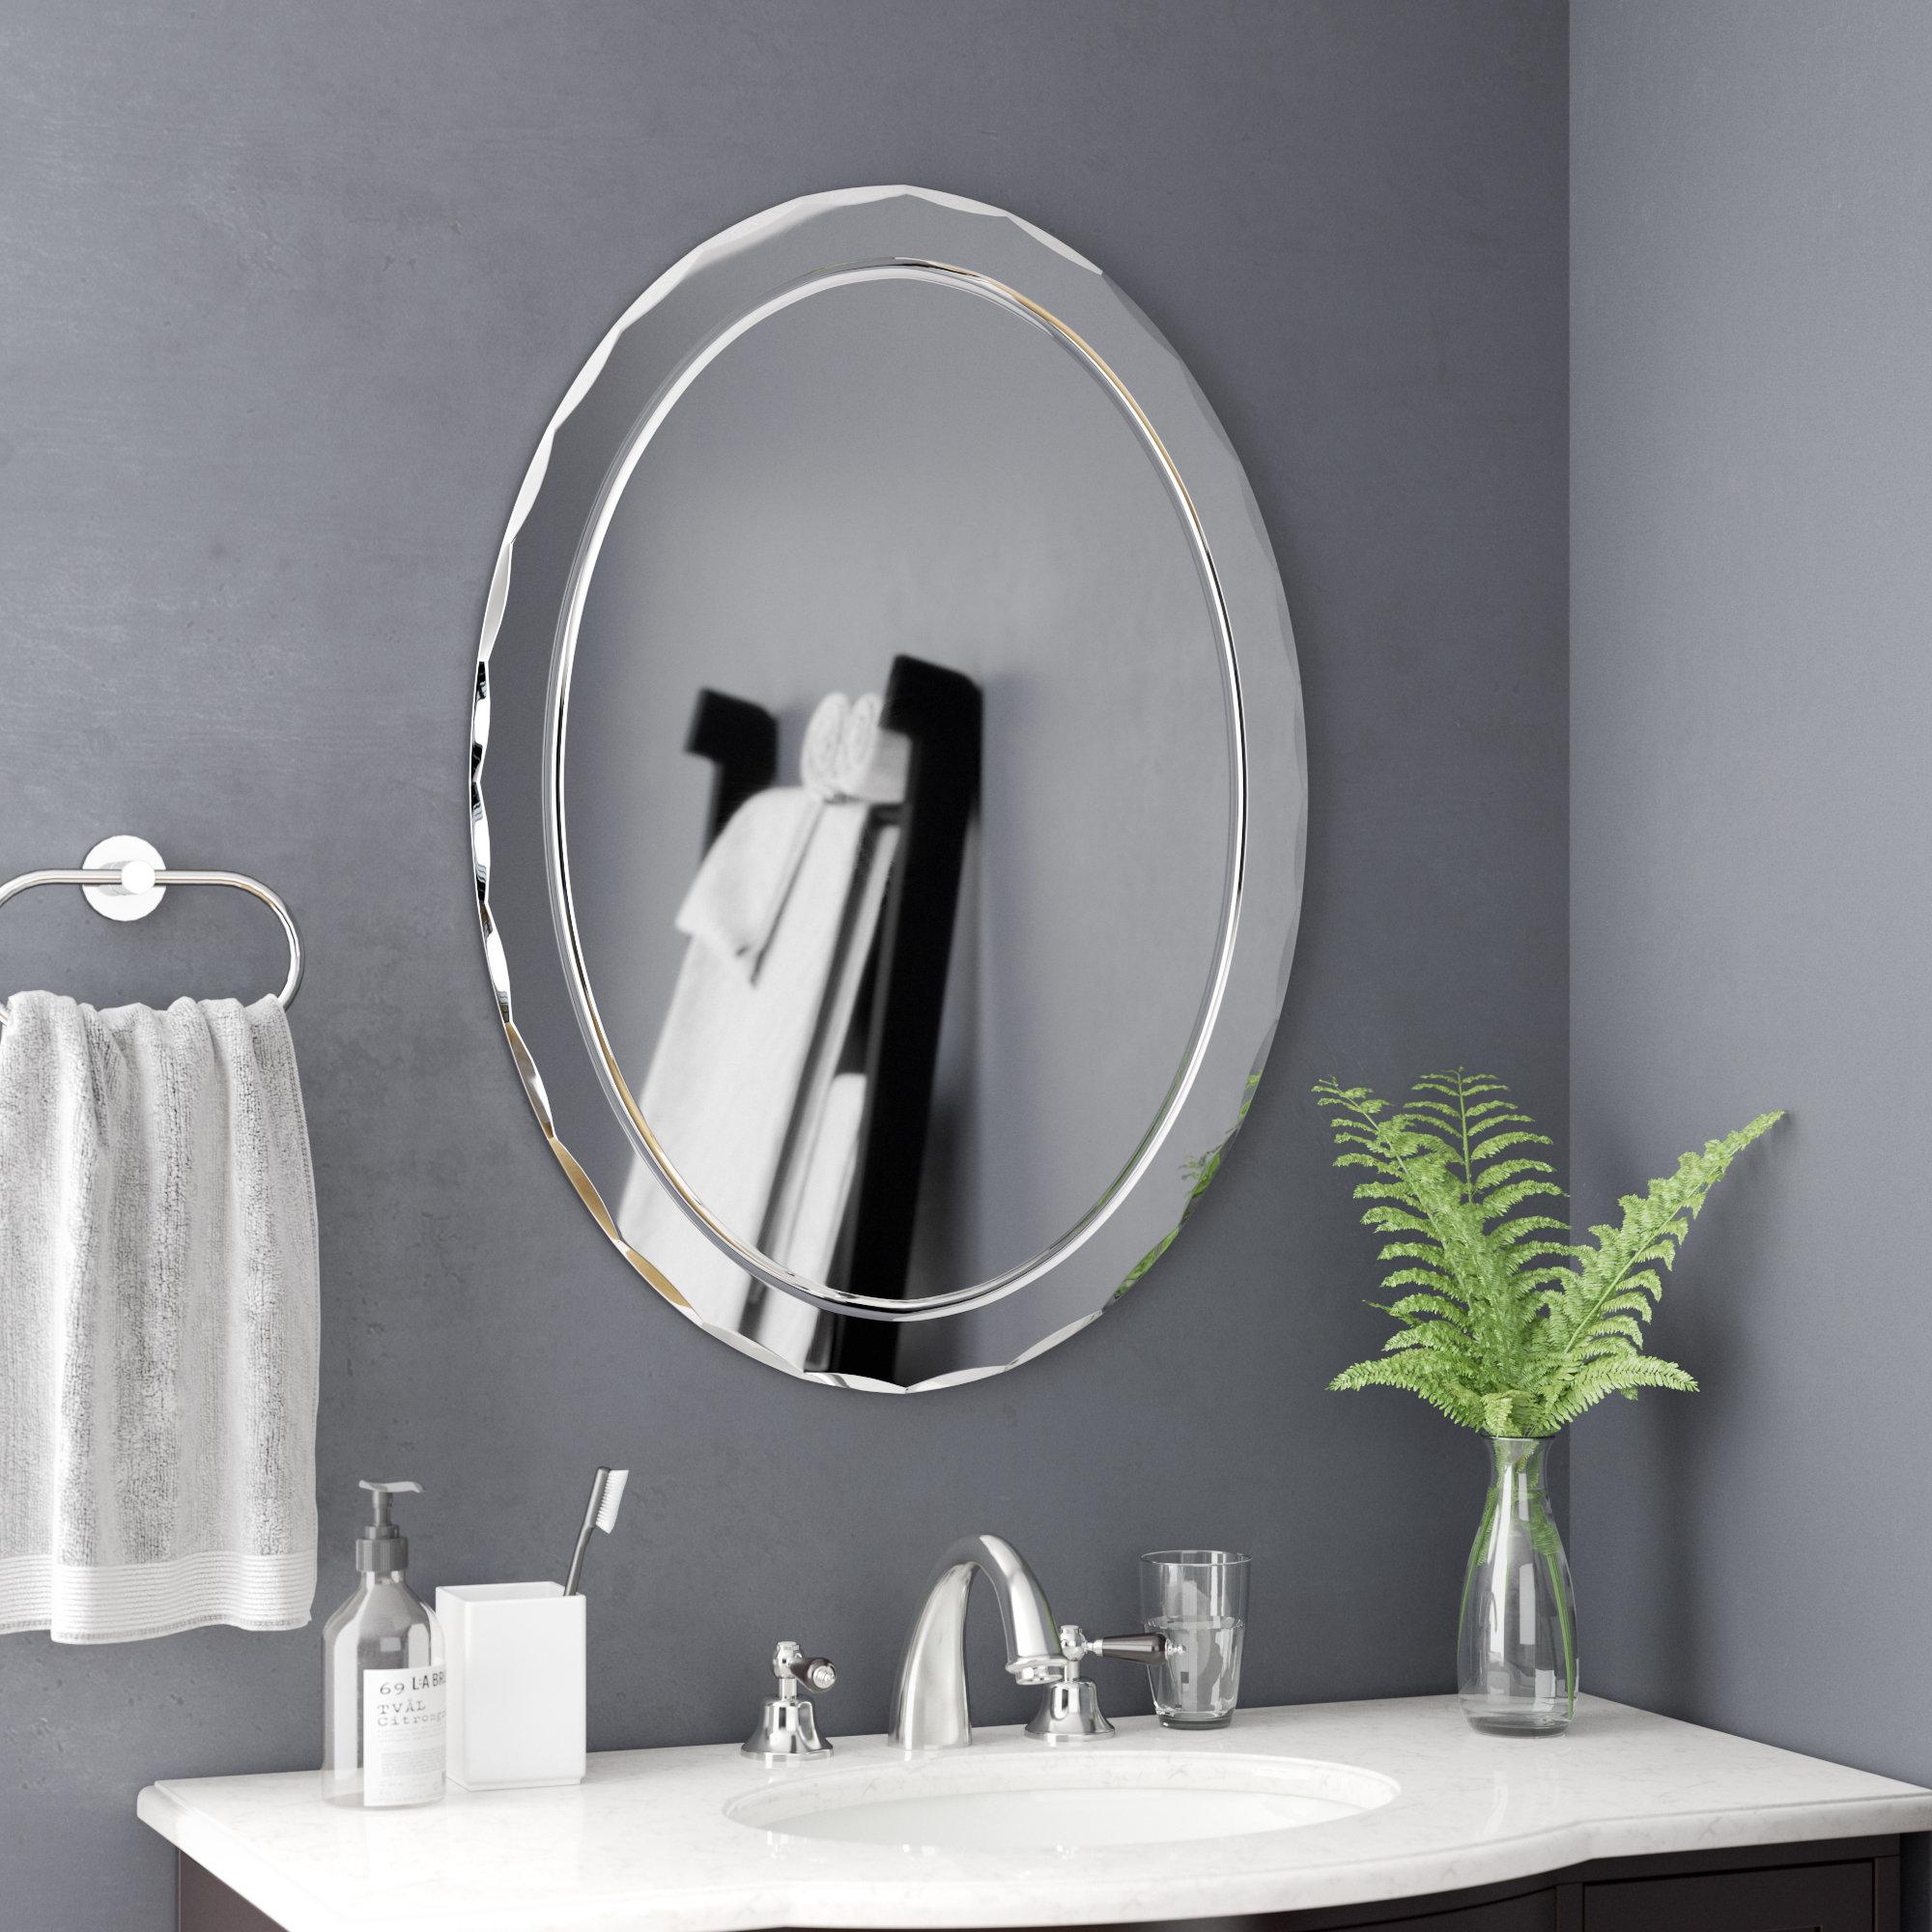 Frameless Wall Mirror Inside Thornbury Oval Bevel Frameless Wall Mirrors (View 10 of 20)